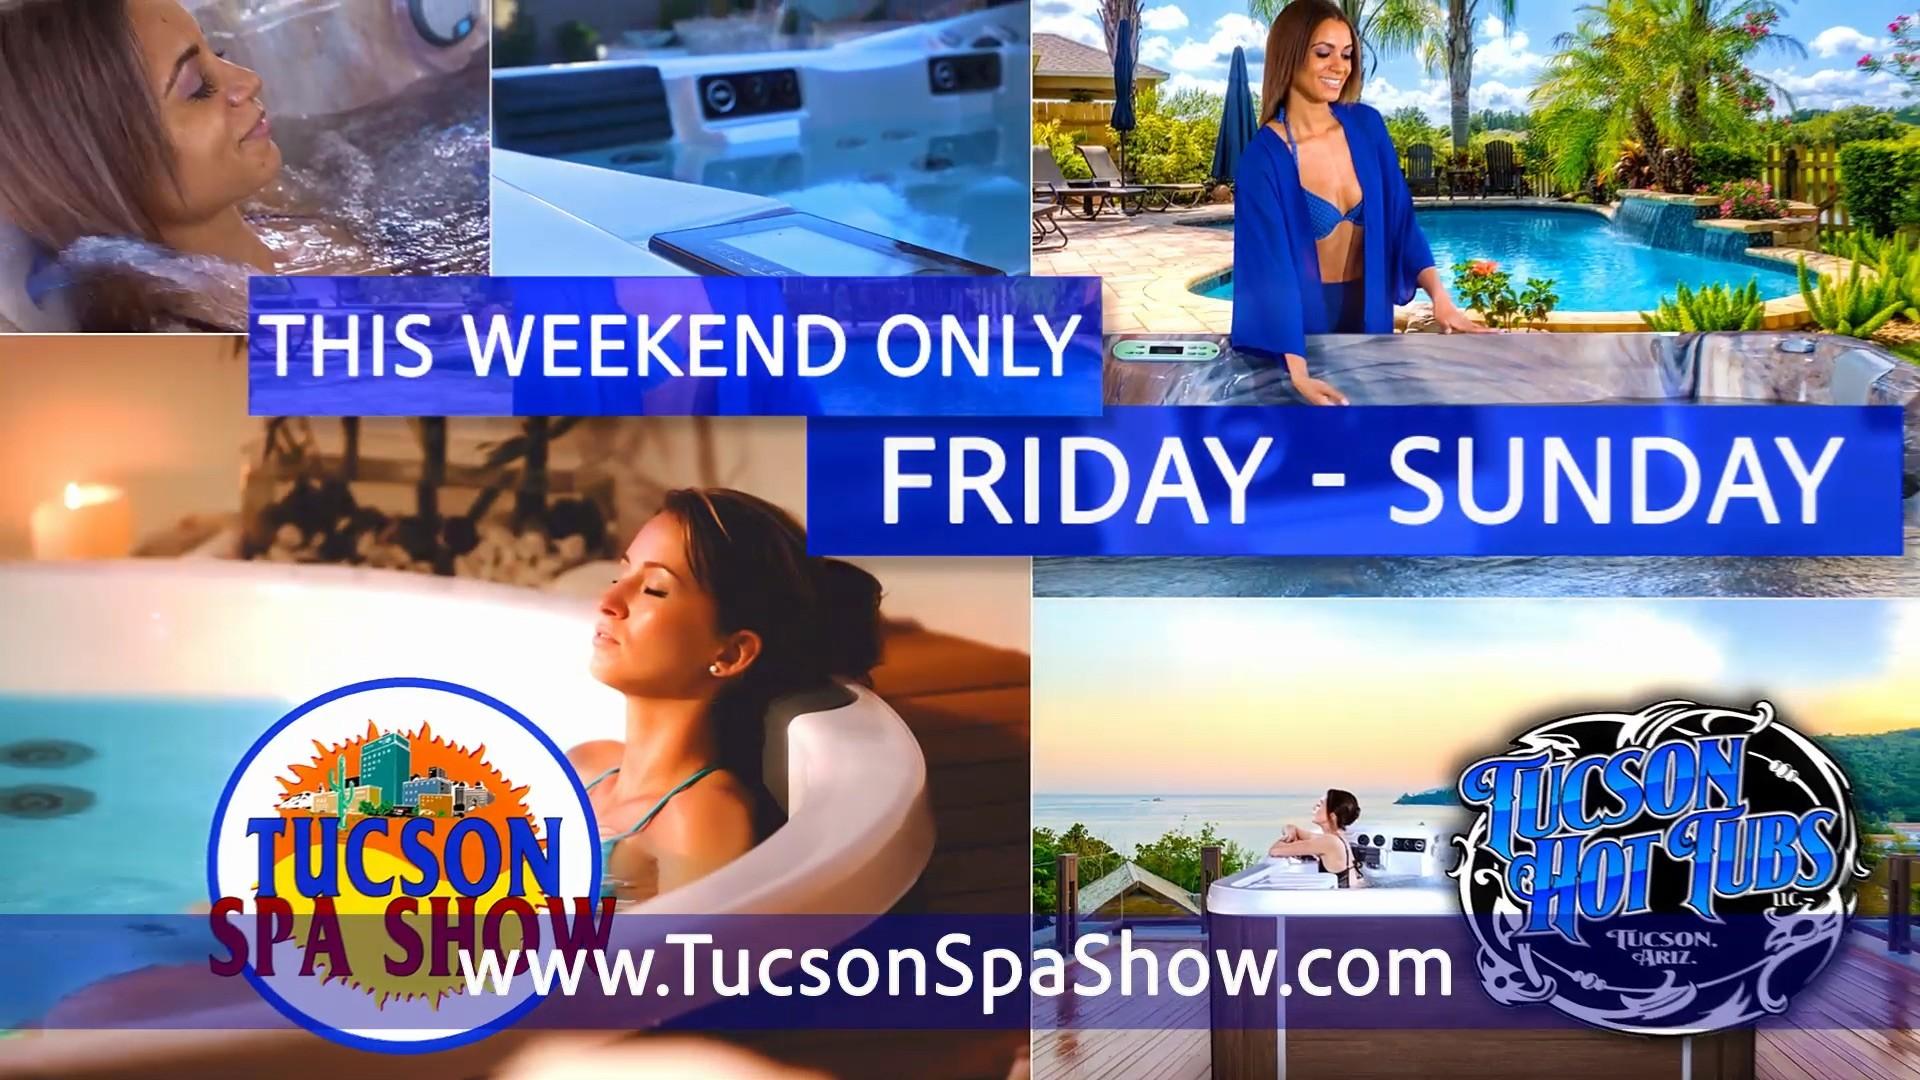 Tucson Hot Tubs: Tucson Spa Show